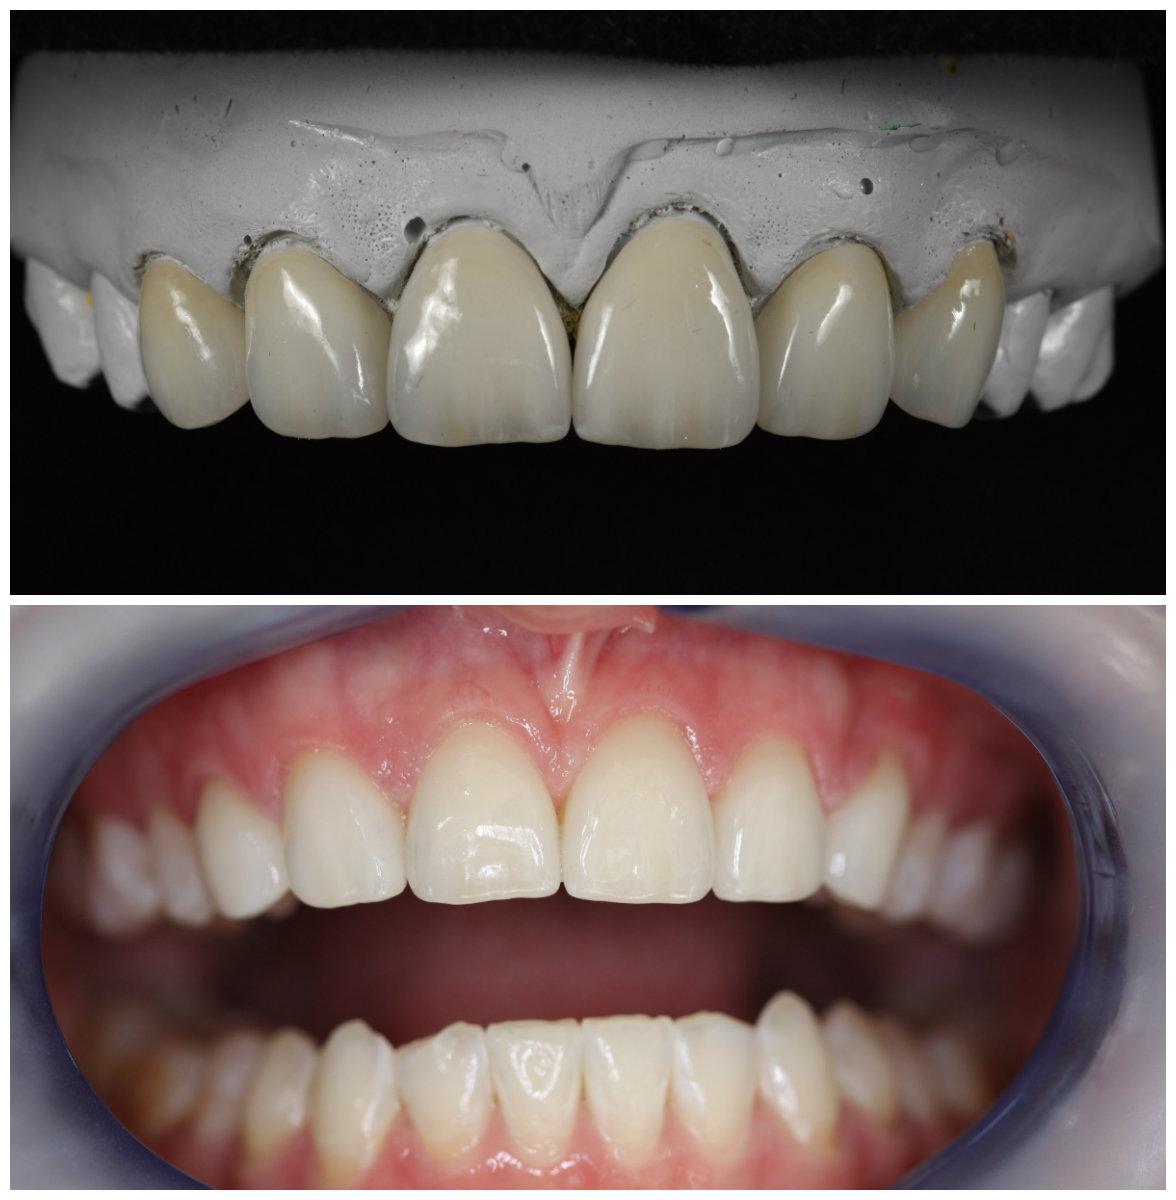 Emax Dental Crowns For Front Teeth - TeethWalls